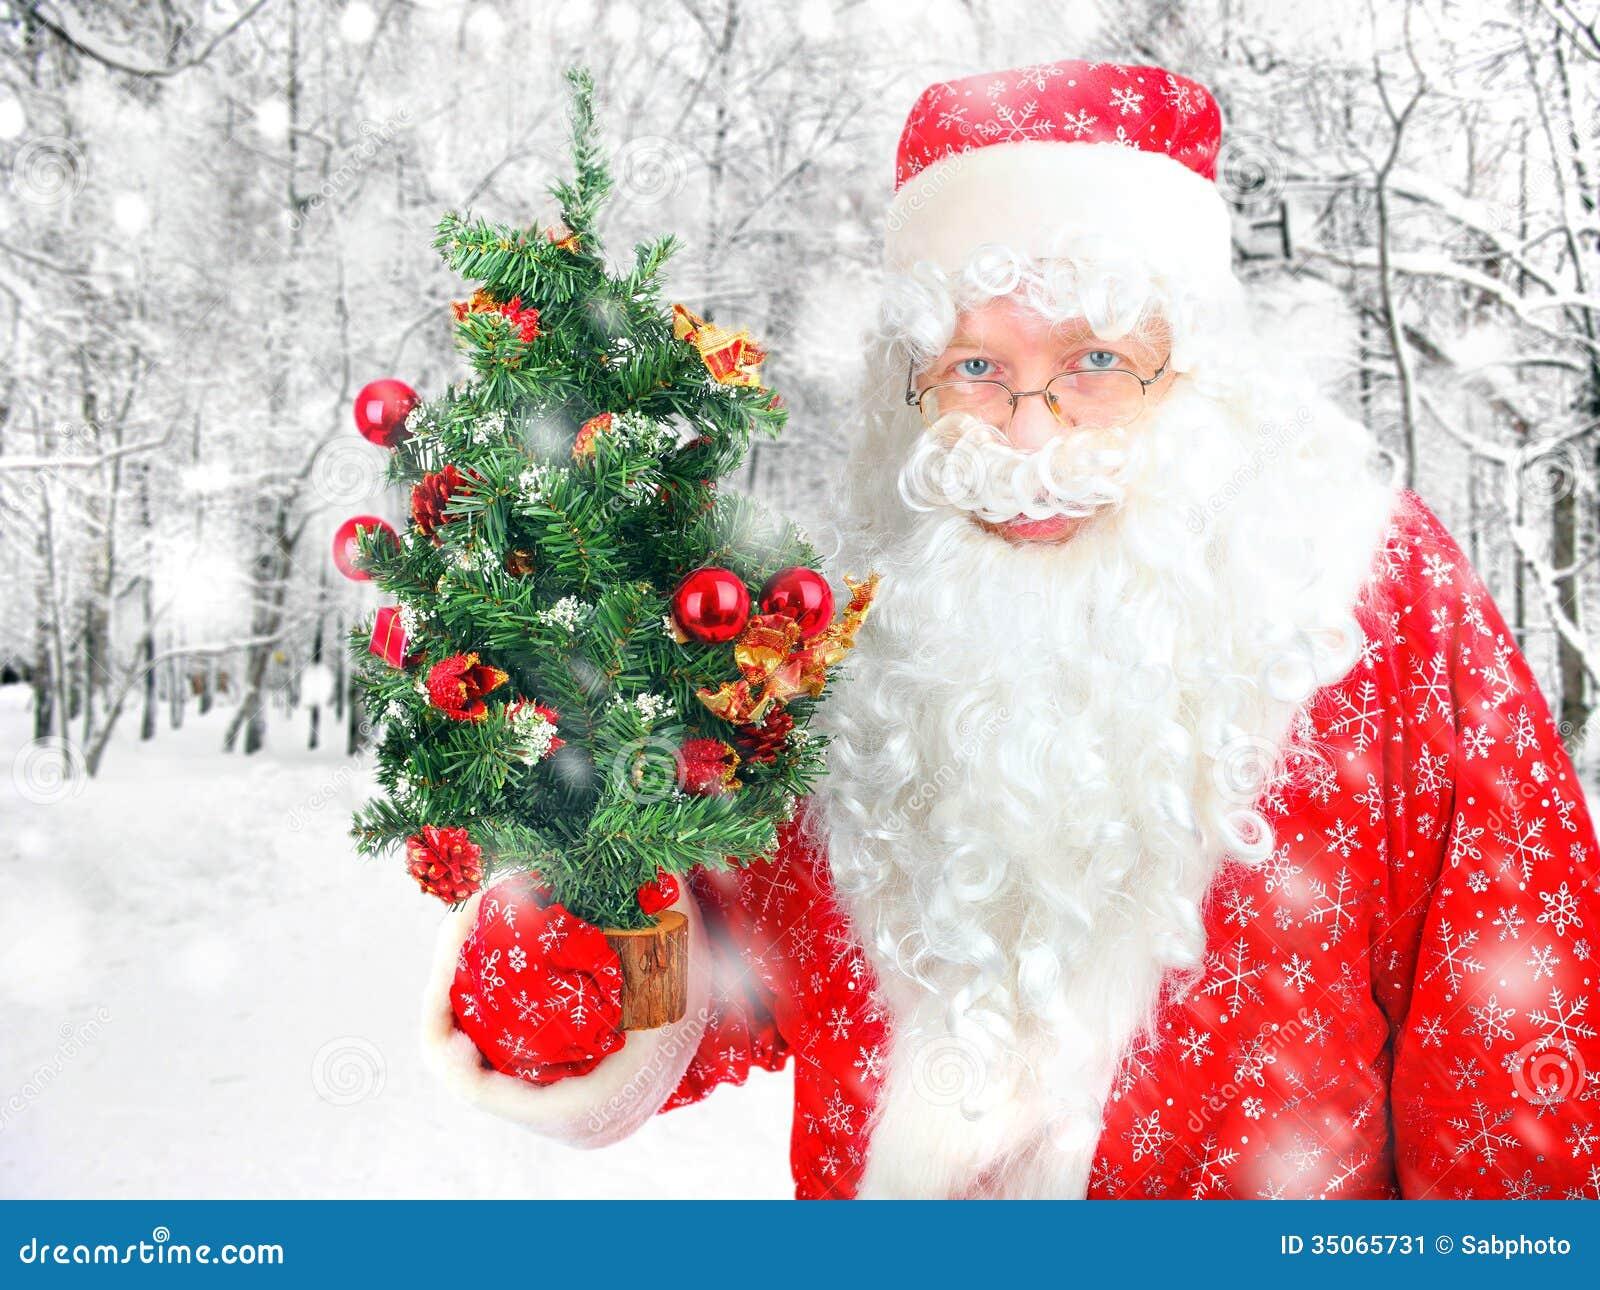 Санта Клаус с рождественской елкой